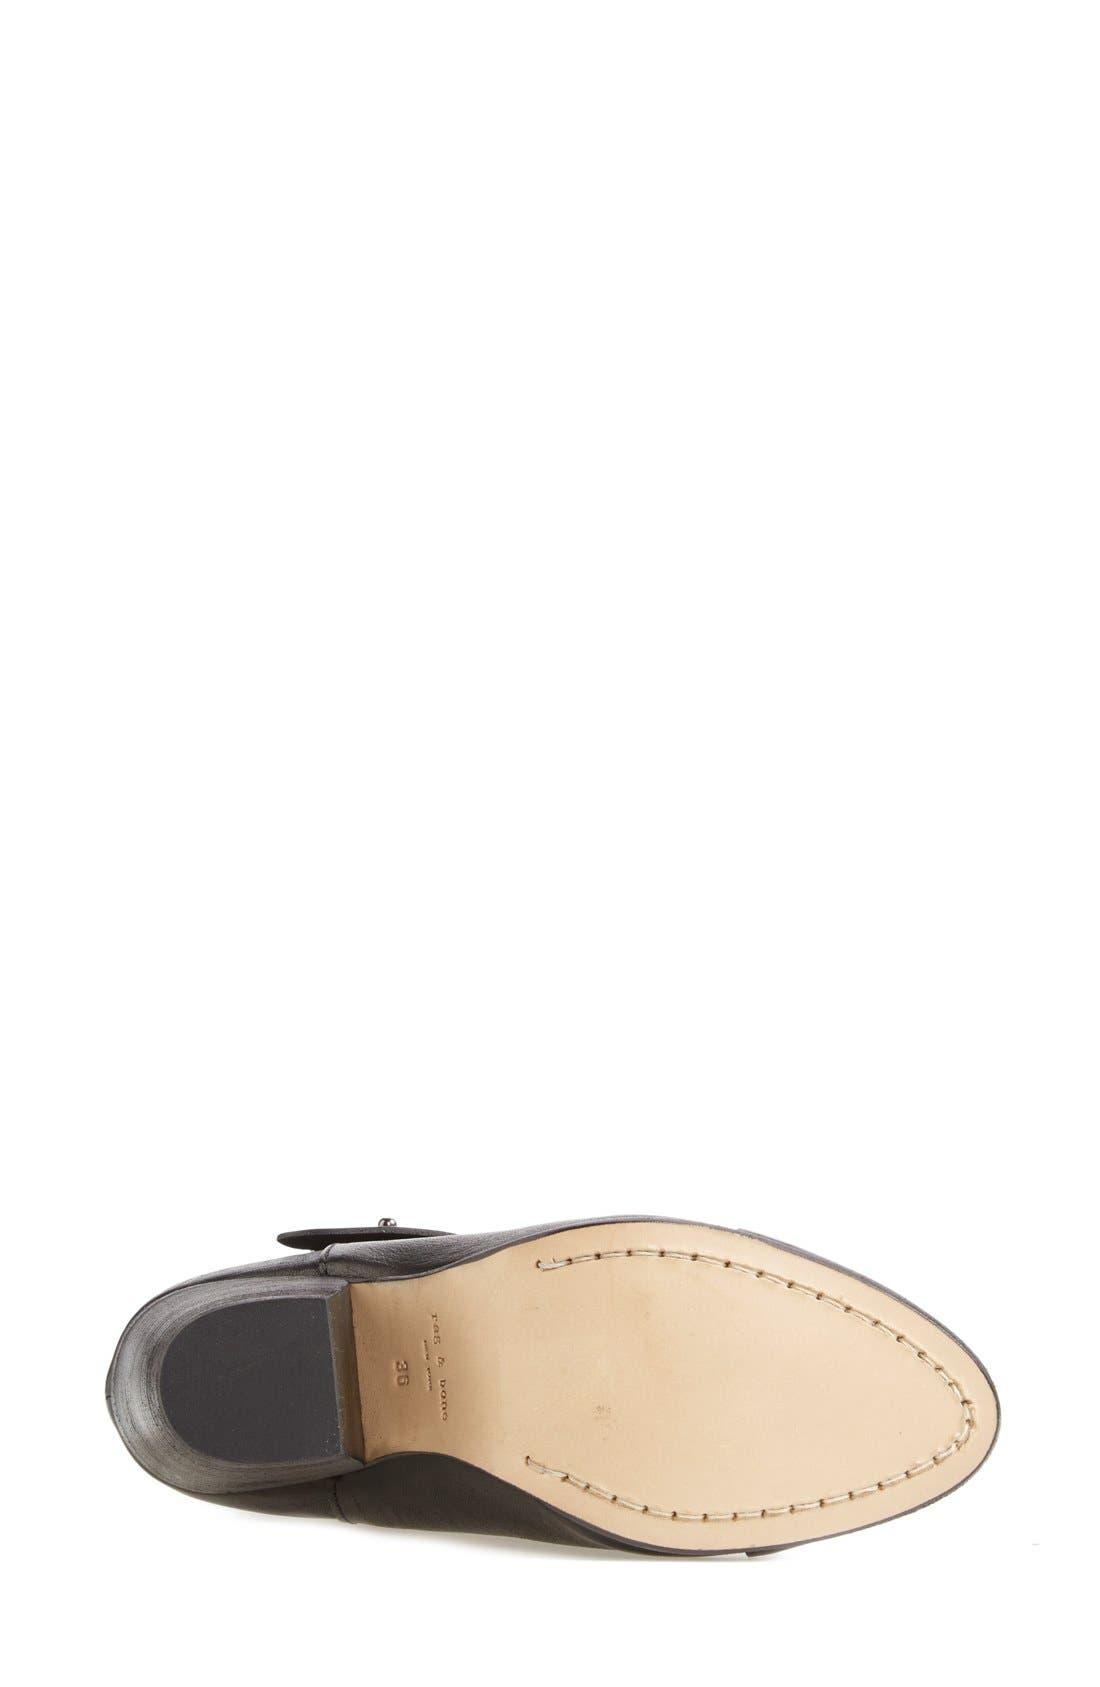 'Harrow' Leather Boot,                             Alternate thumbnail 6, color,                             BLACK